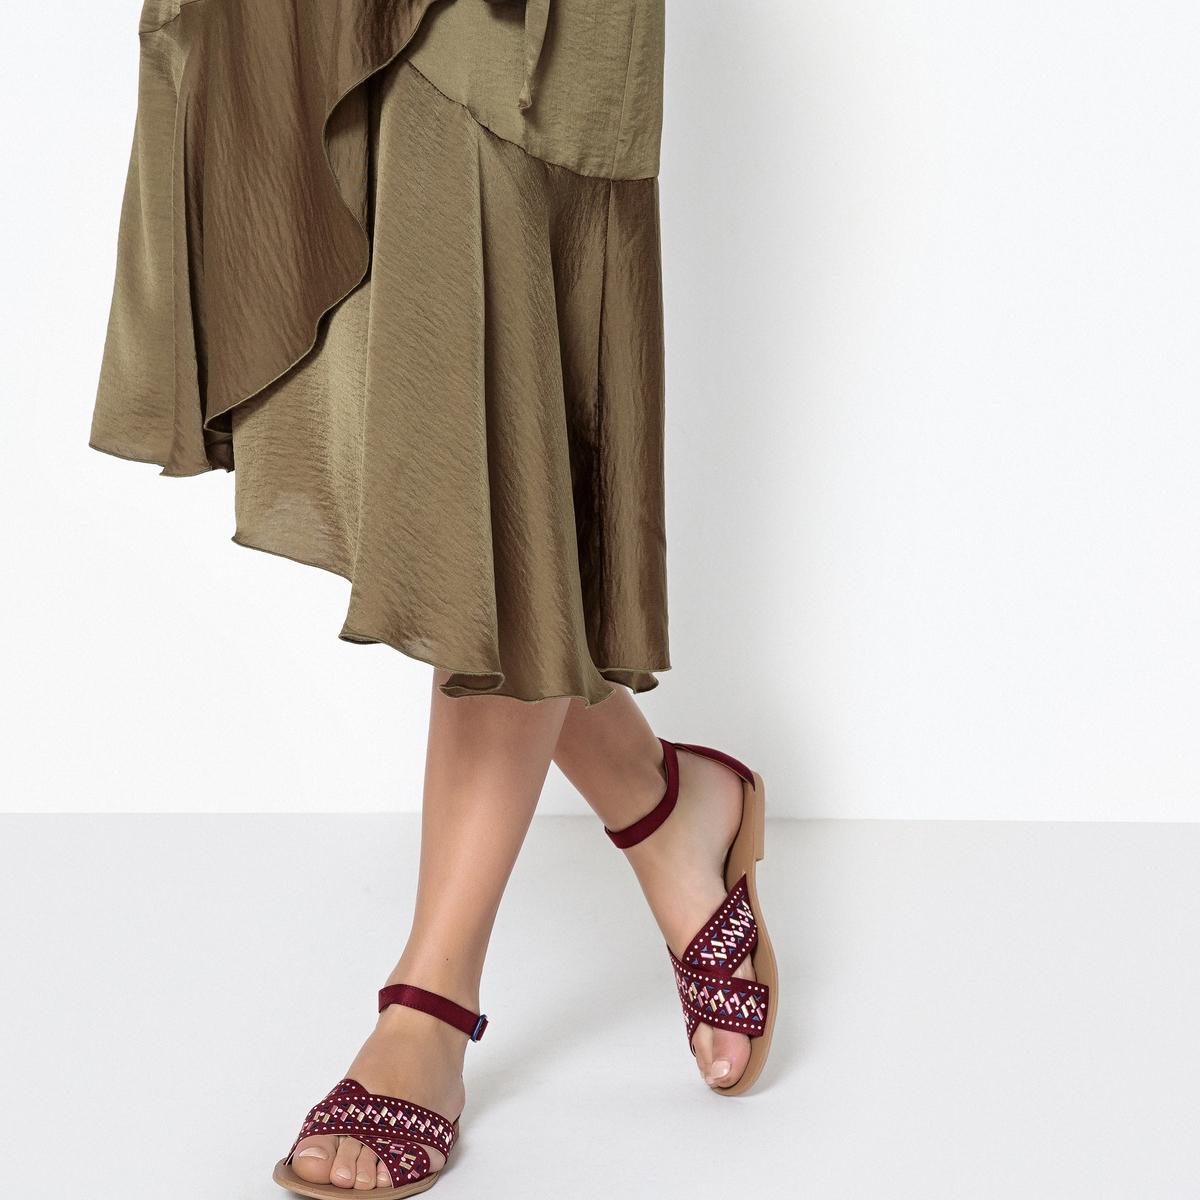 Sandalias con motivos bordados